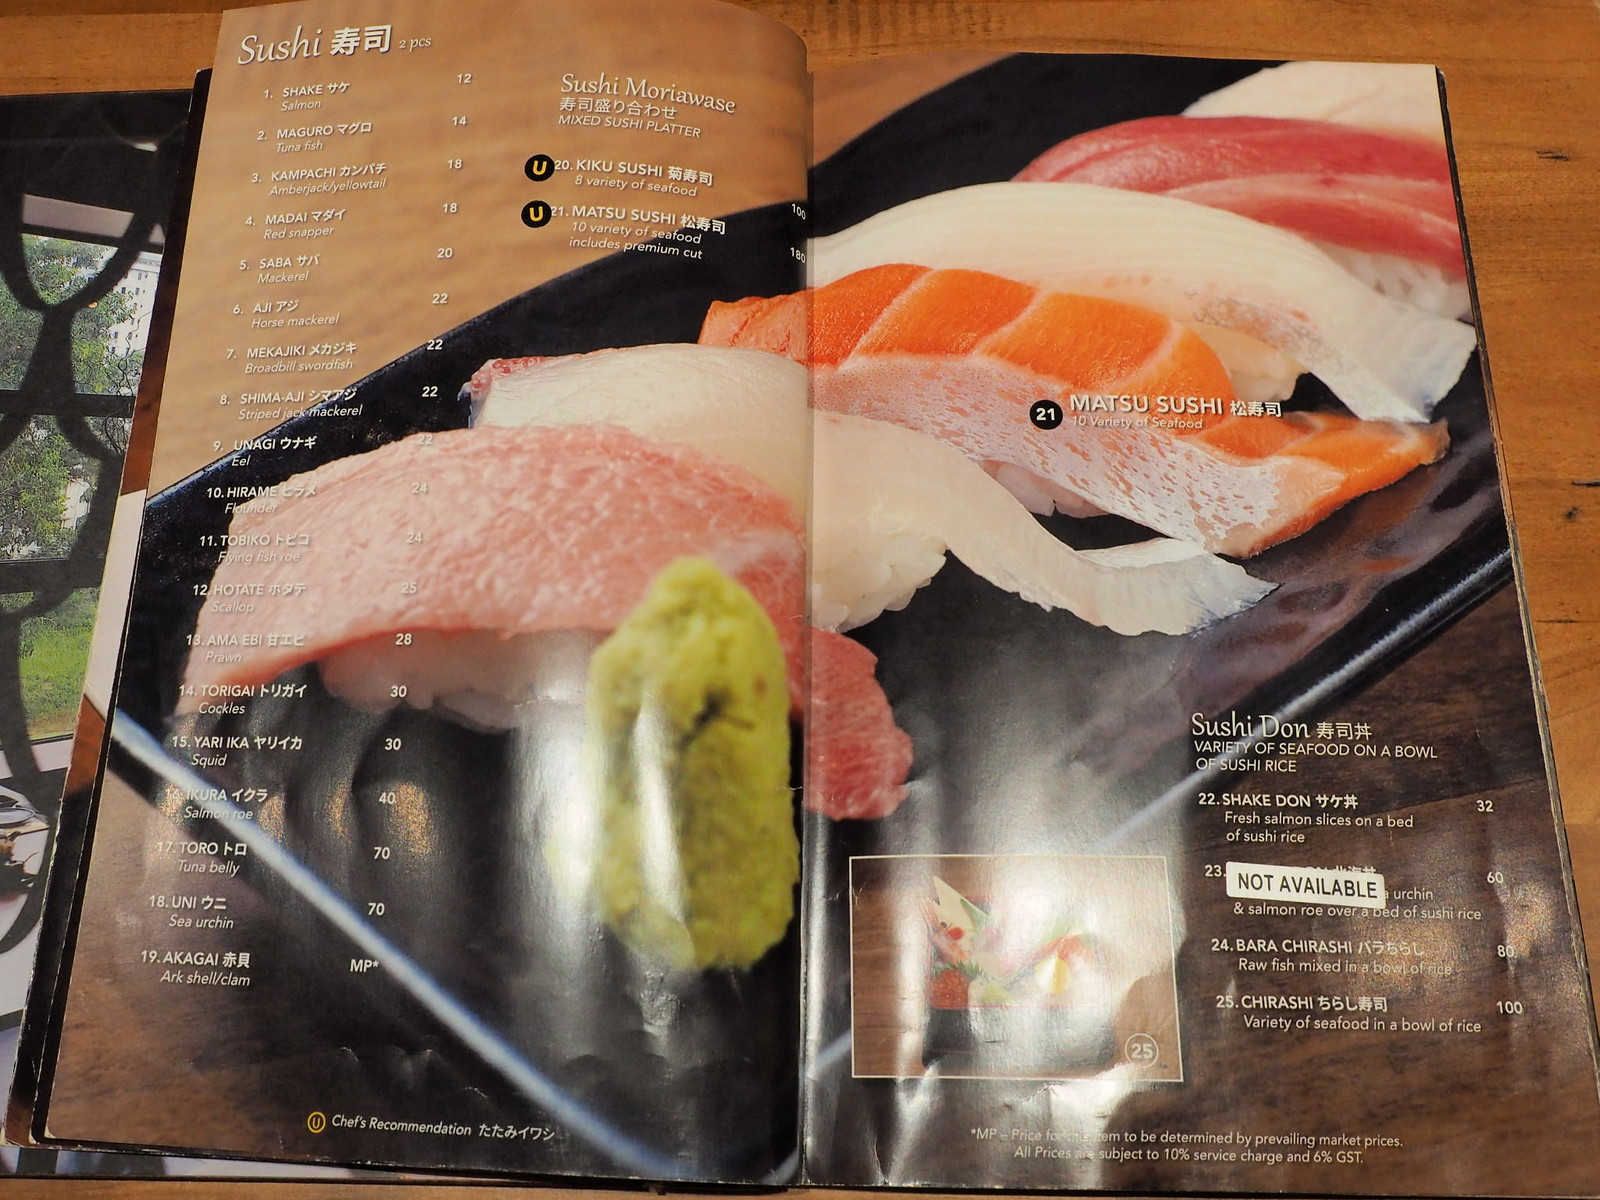 Uroko Japanese Cuisine's Sushi Menu